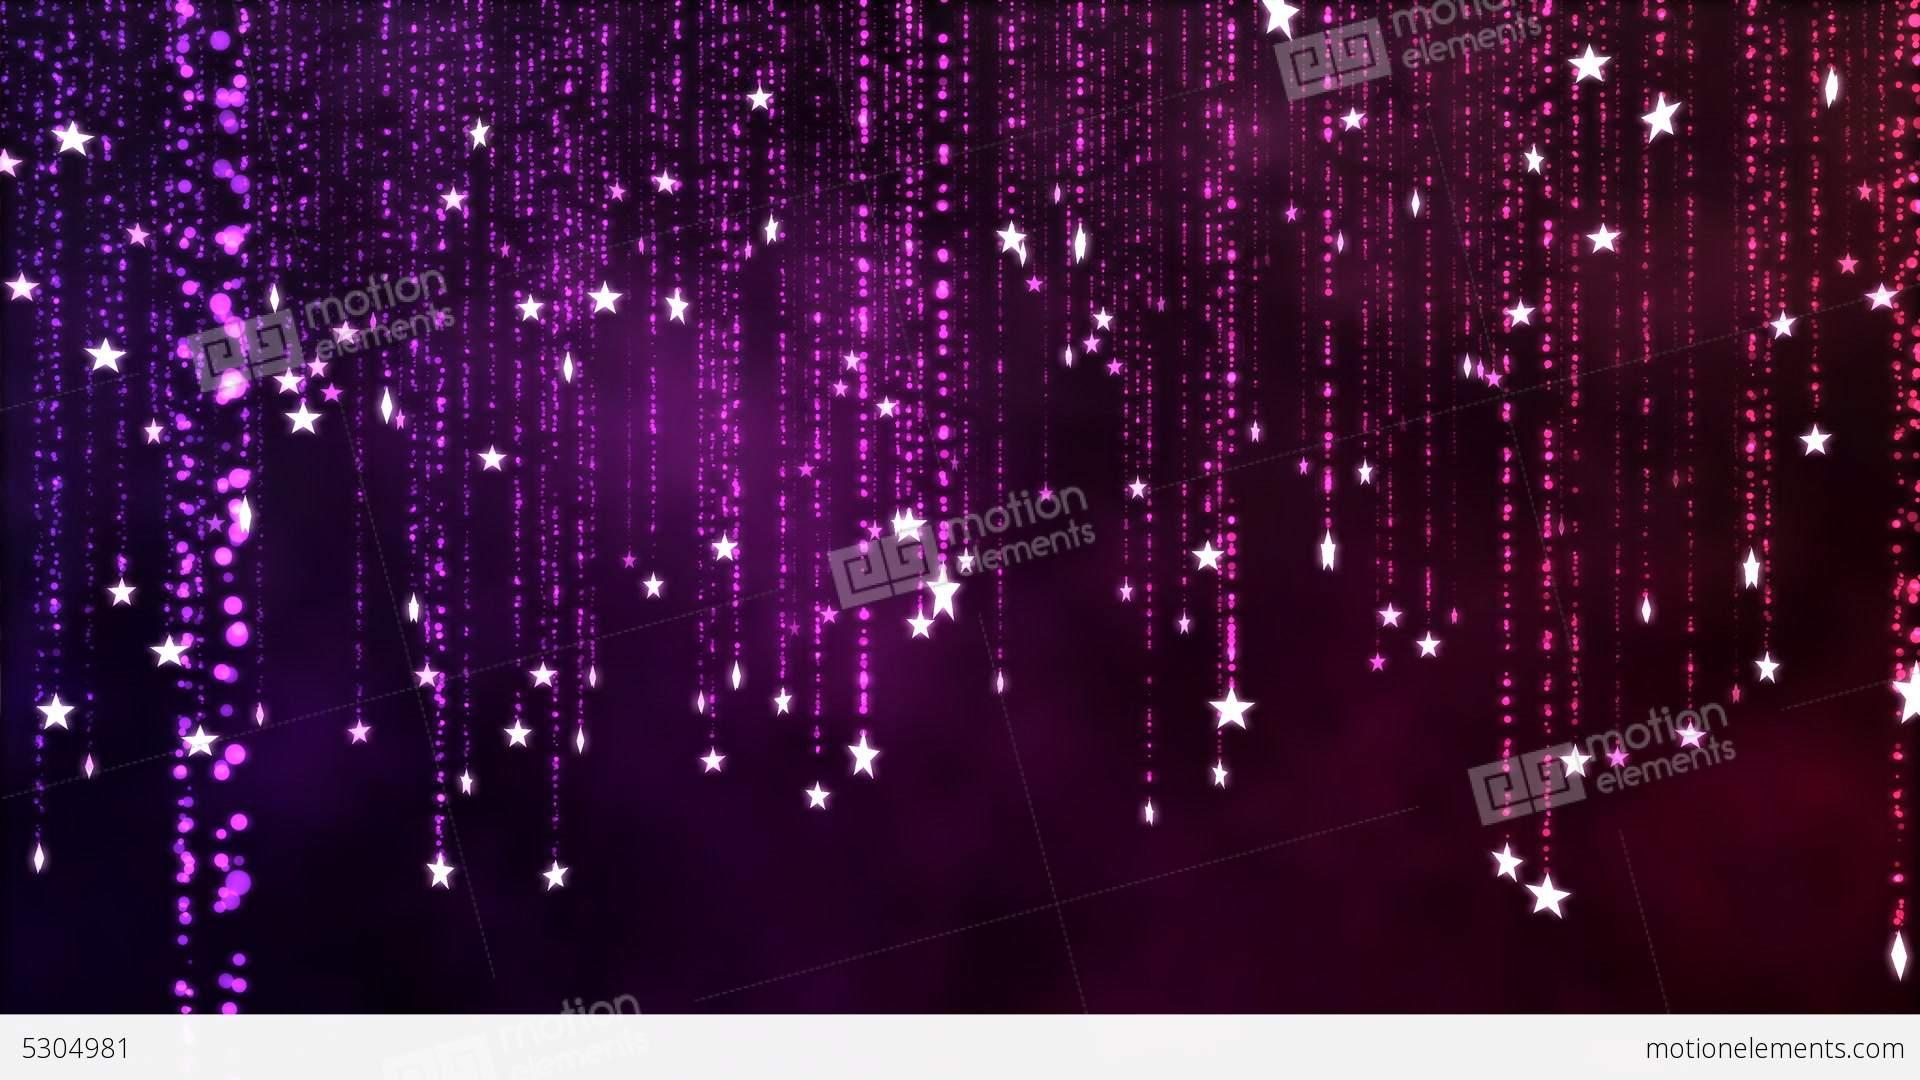 Falling Money Wallpaper Hd Glitter Stars Christmas Decoration Loop Stock Animation